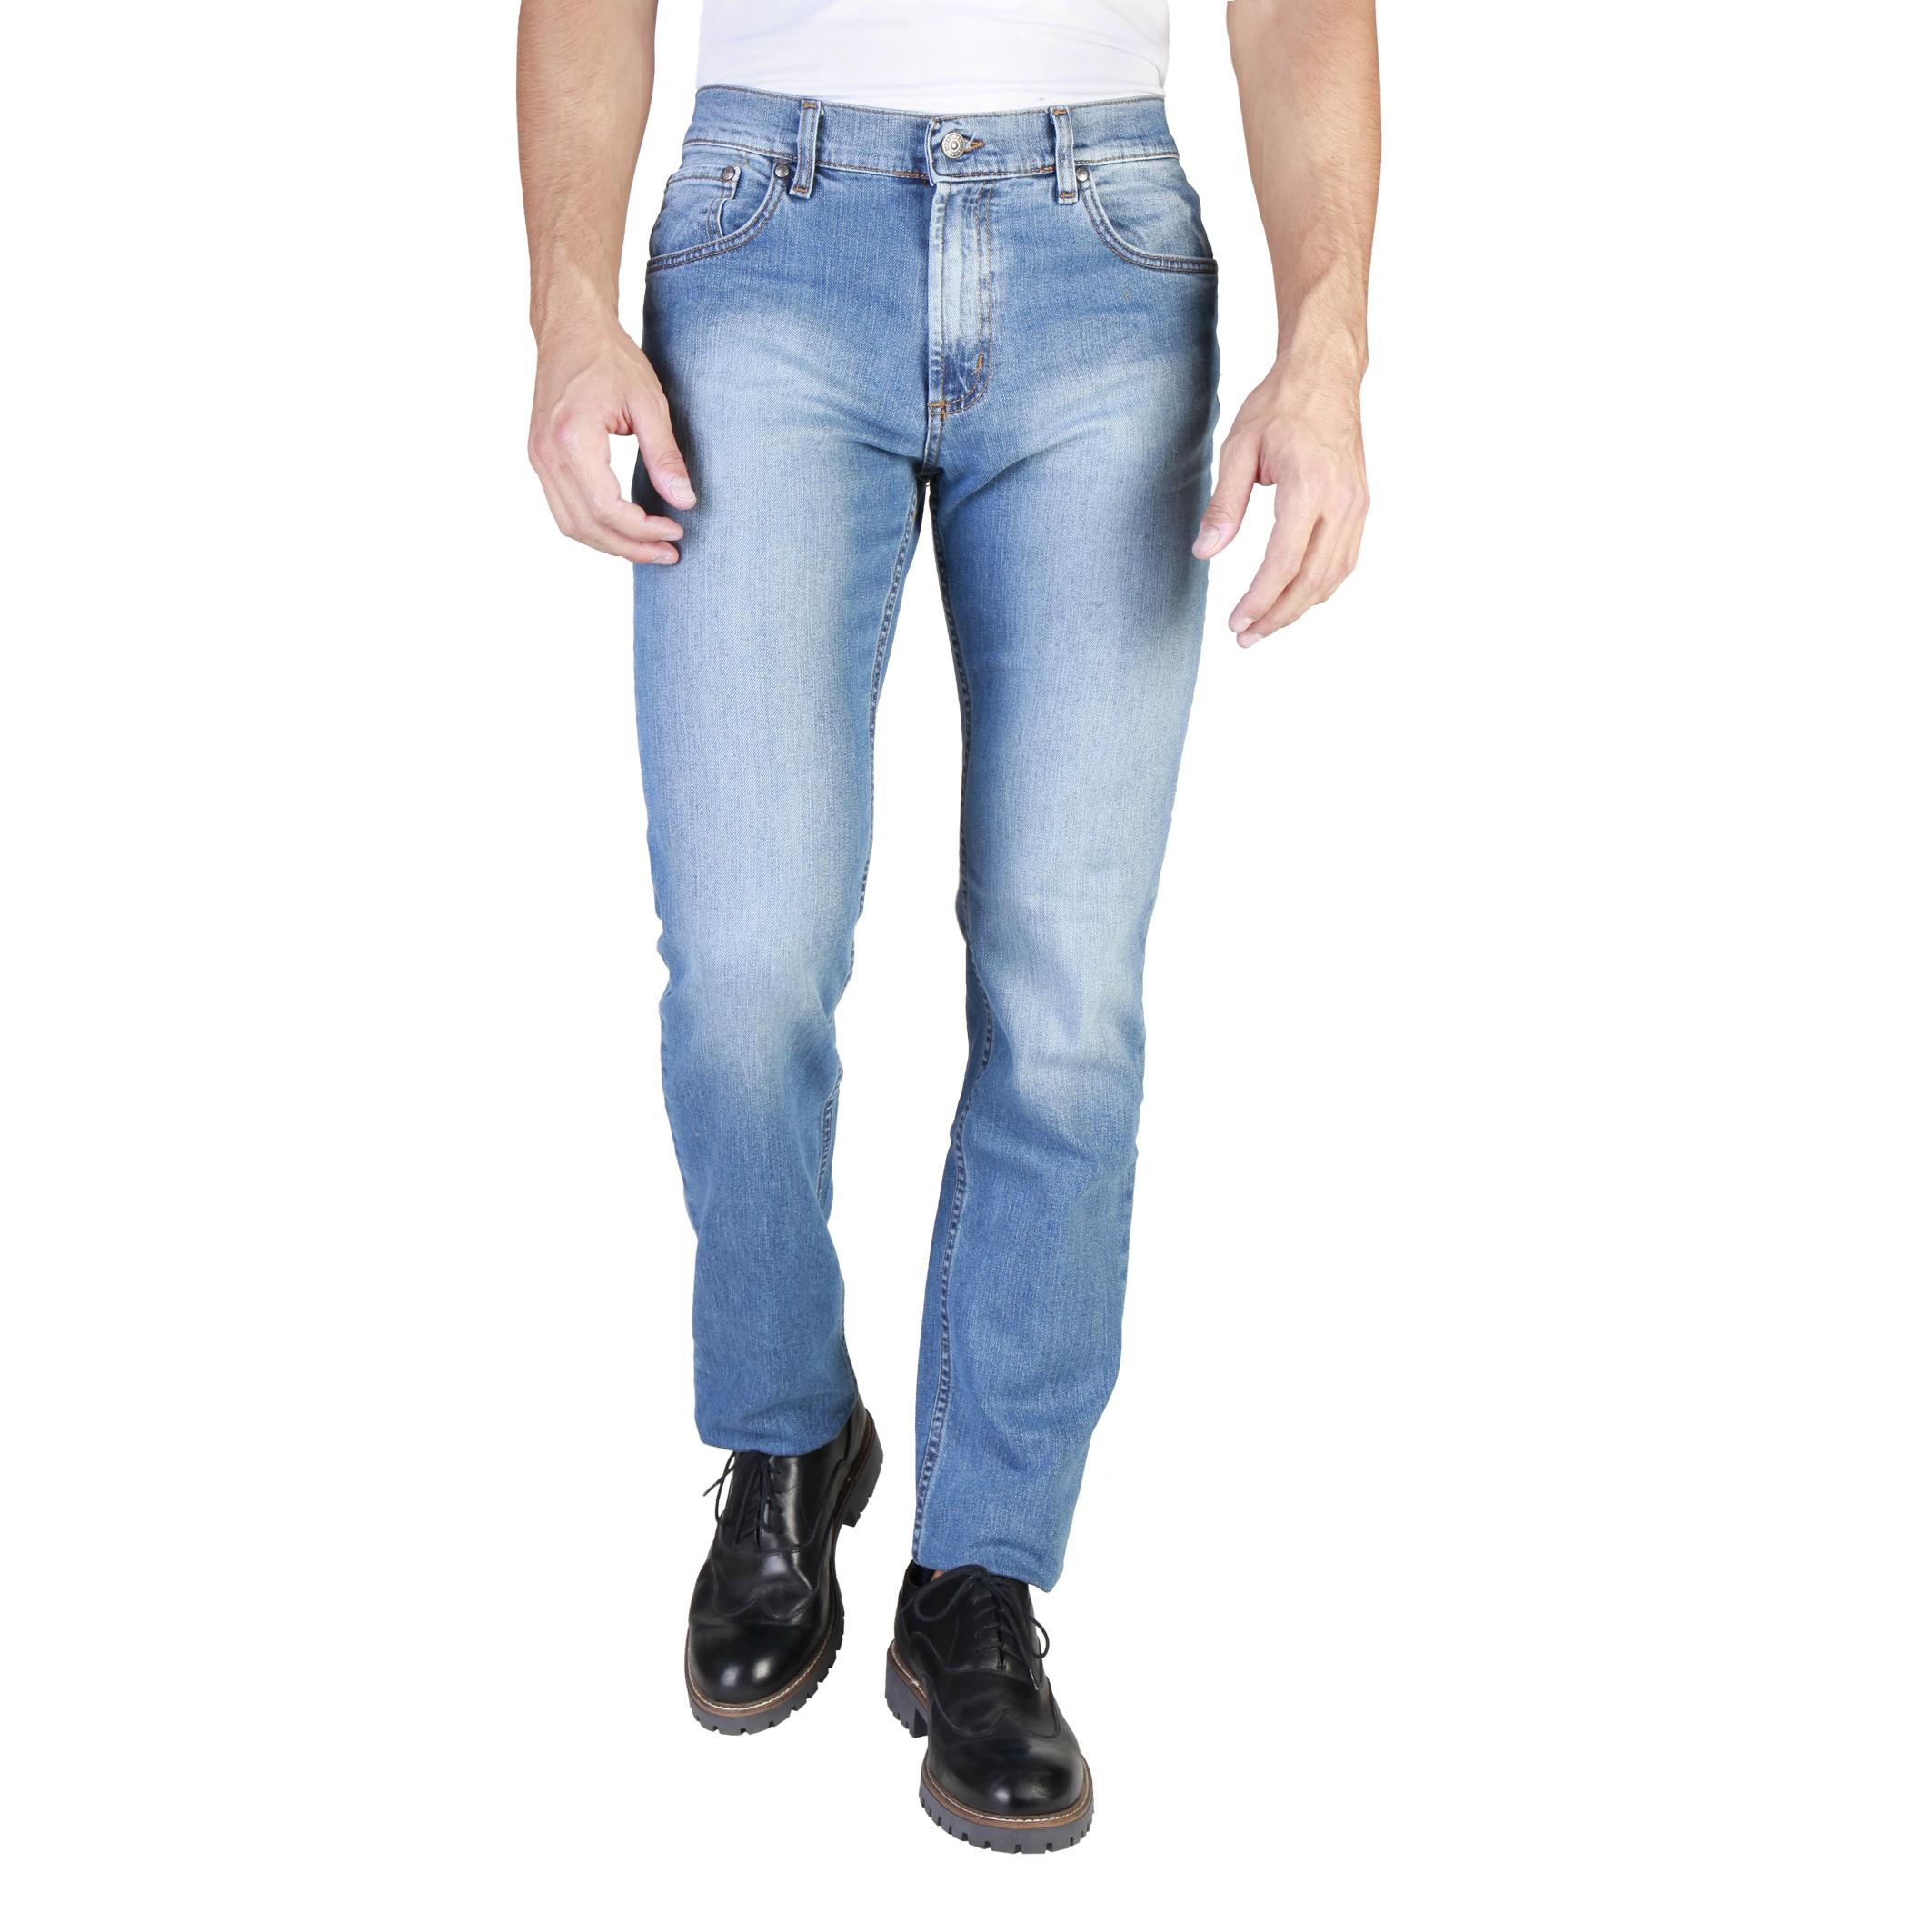 Jeans Carrera Jeans 000700_0921S Uomo Blu 85302